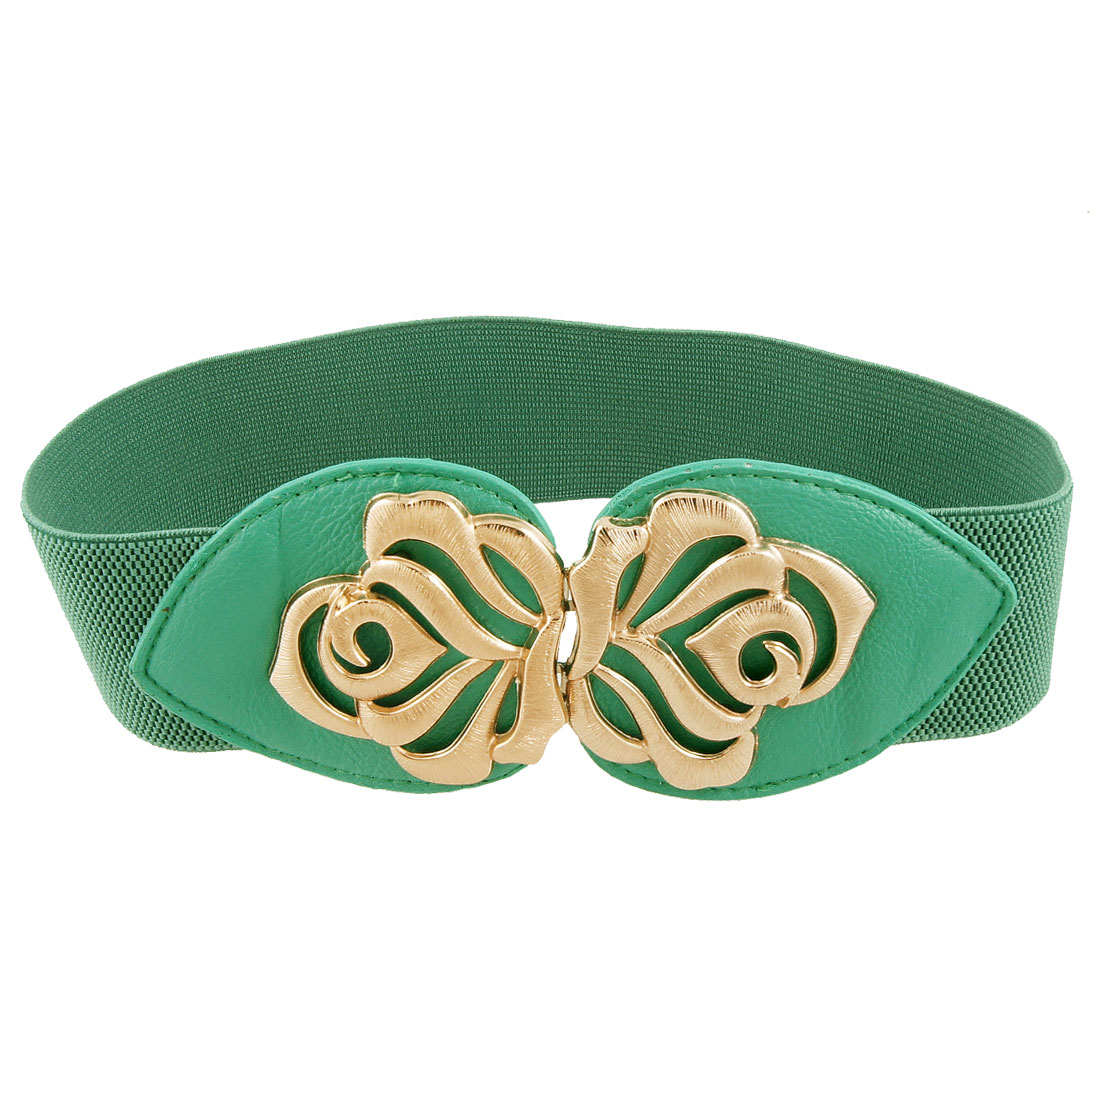 Ladies Gold Tone Flower Decor Interlocking Buckle Green Stretchy Cinch Belt